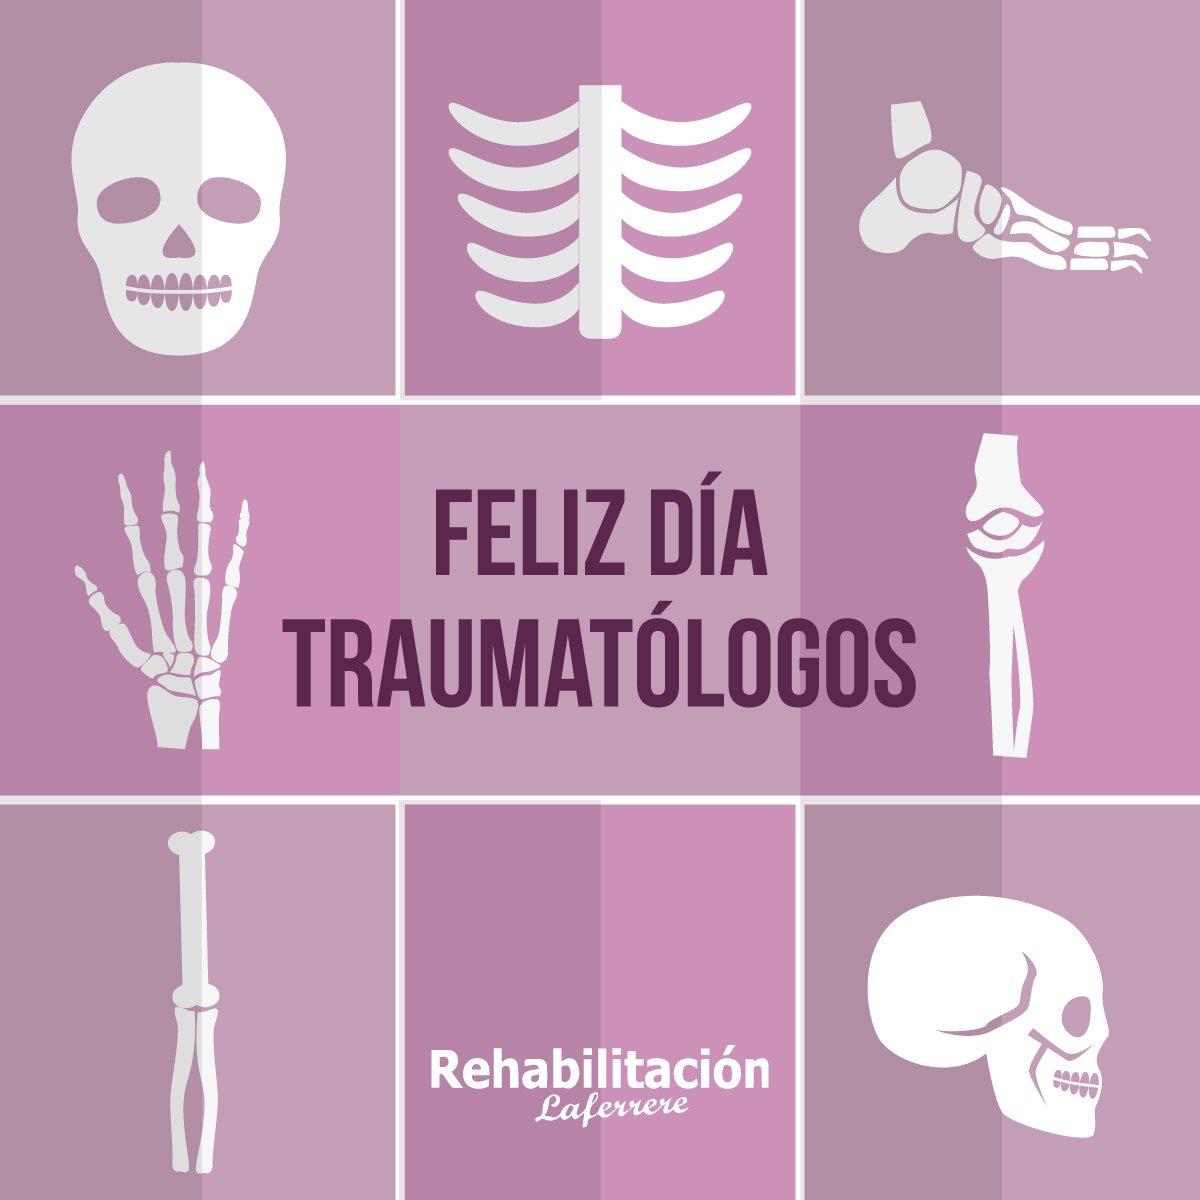 feliz dia a los traumatologos